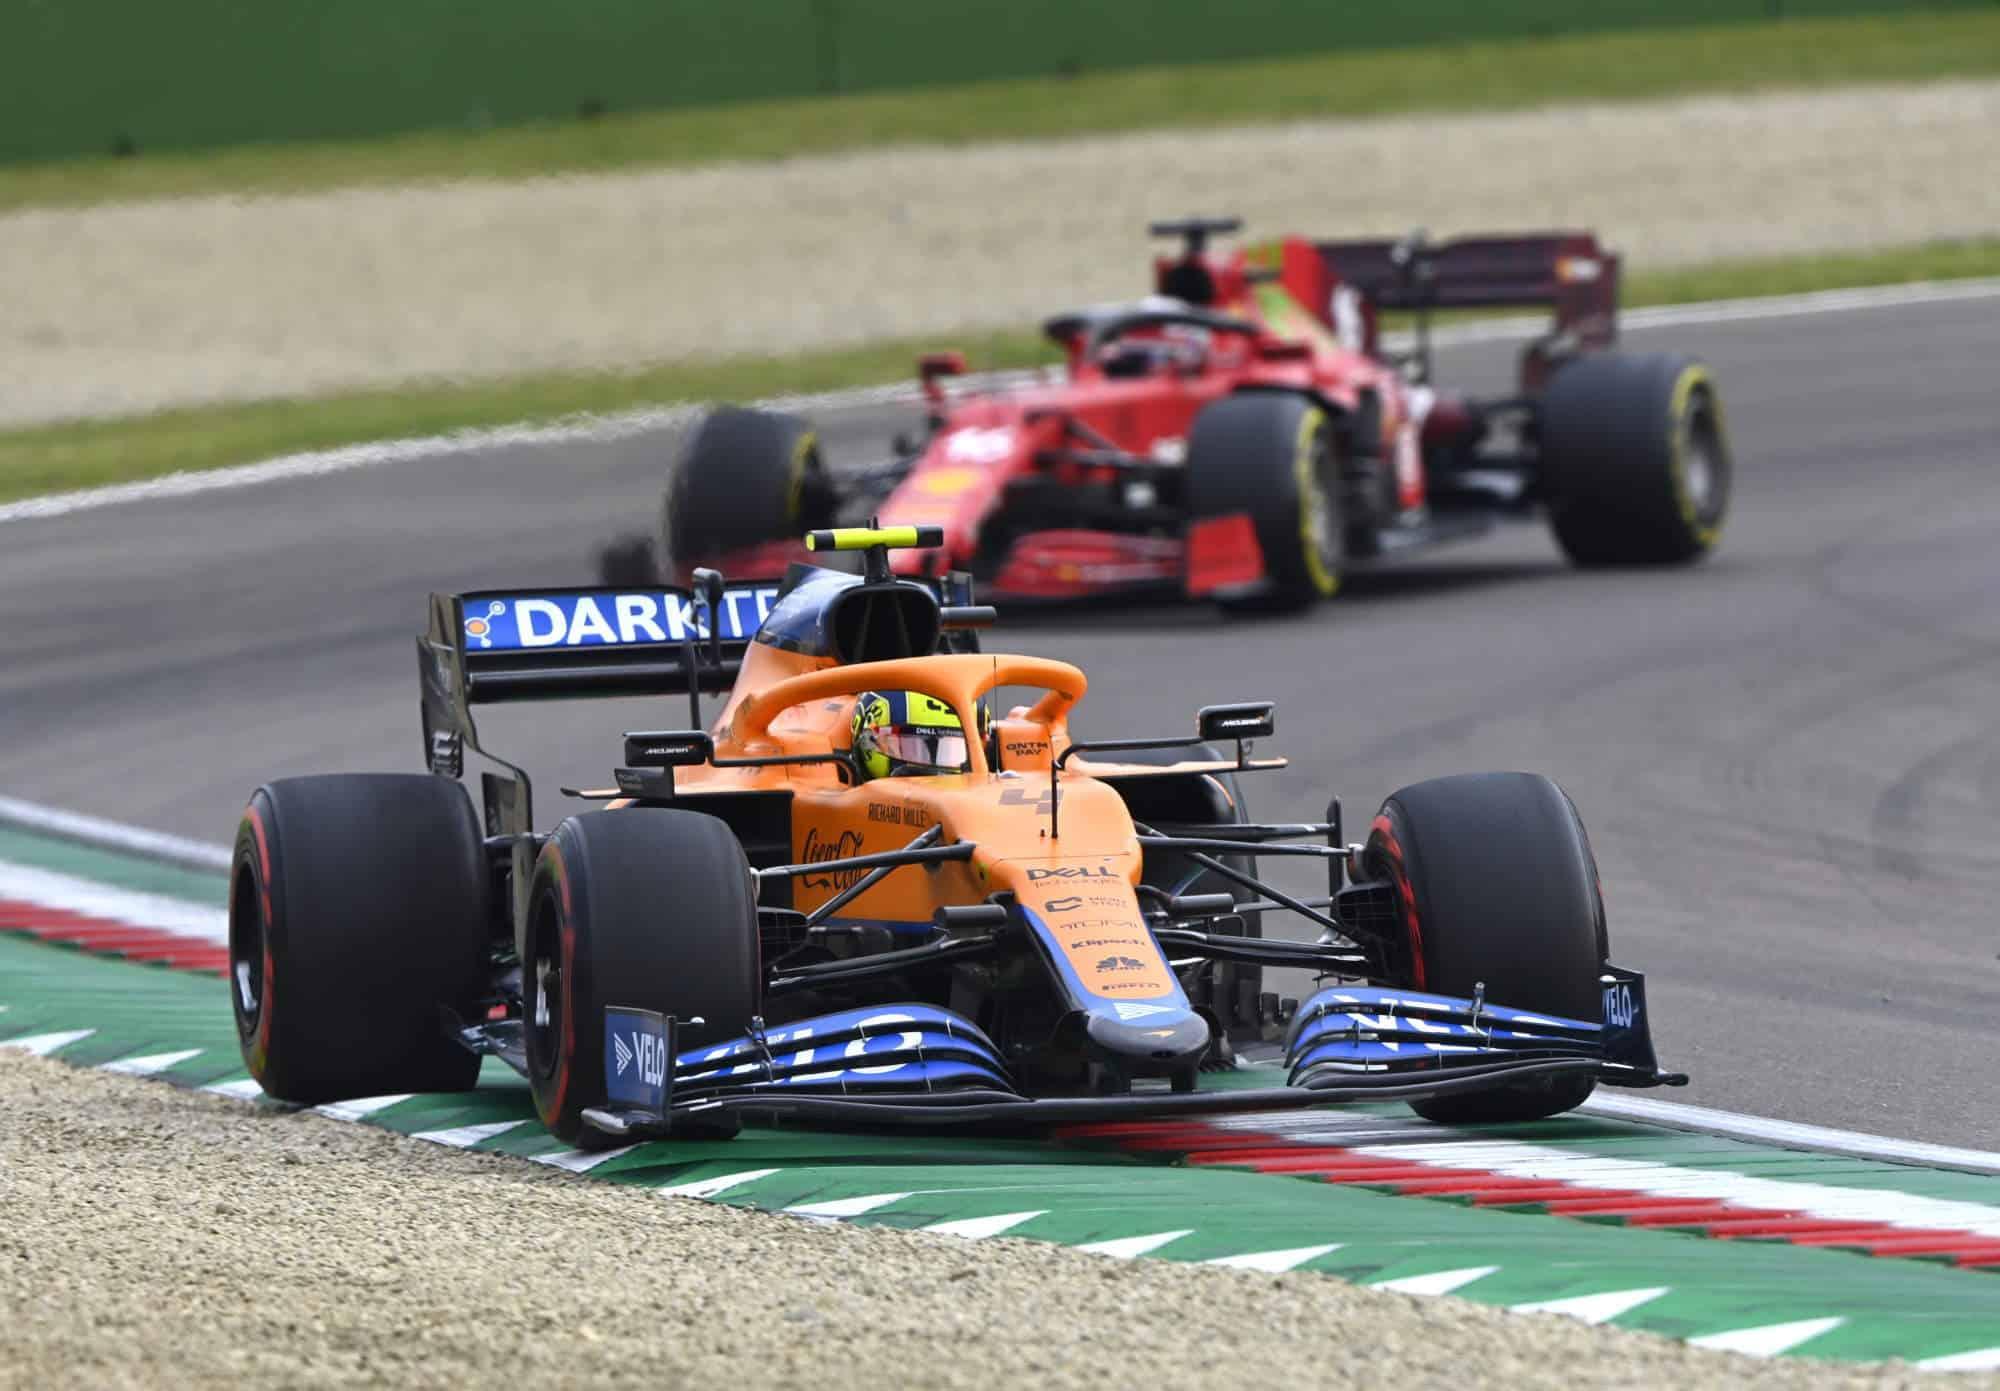 2021 Emilia Romagna GP Norris leads Leclerc in the race Photo McLaren